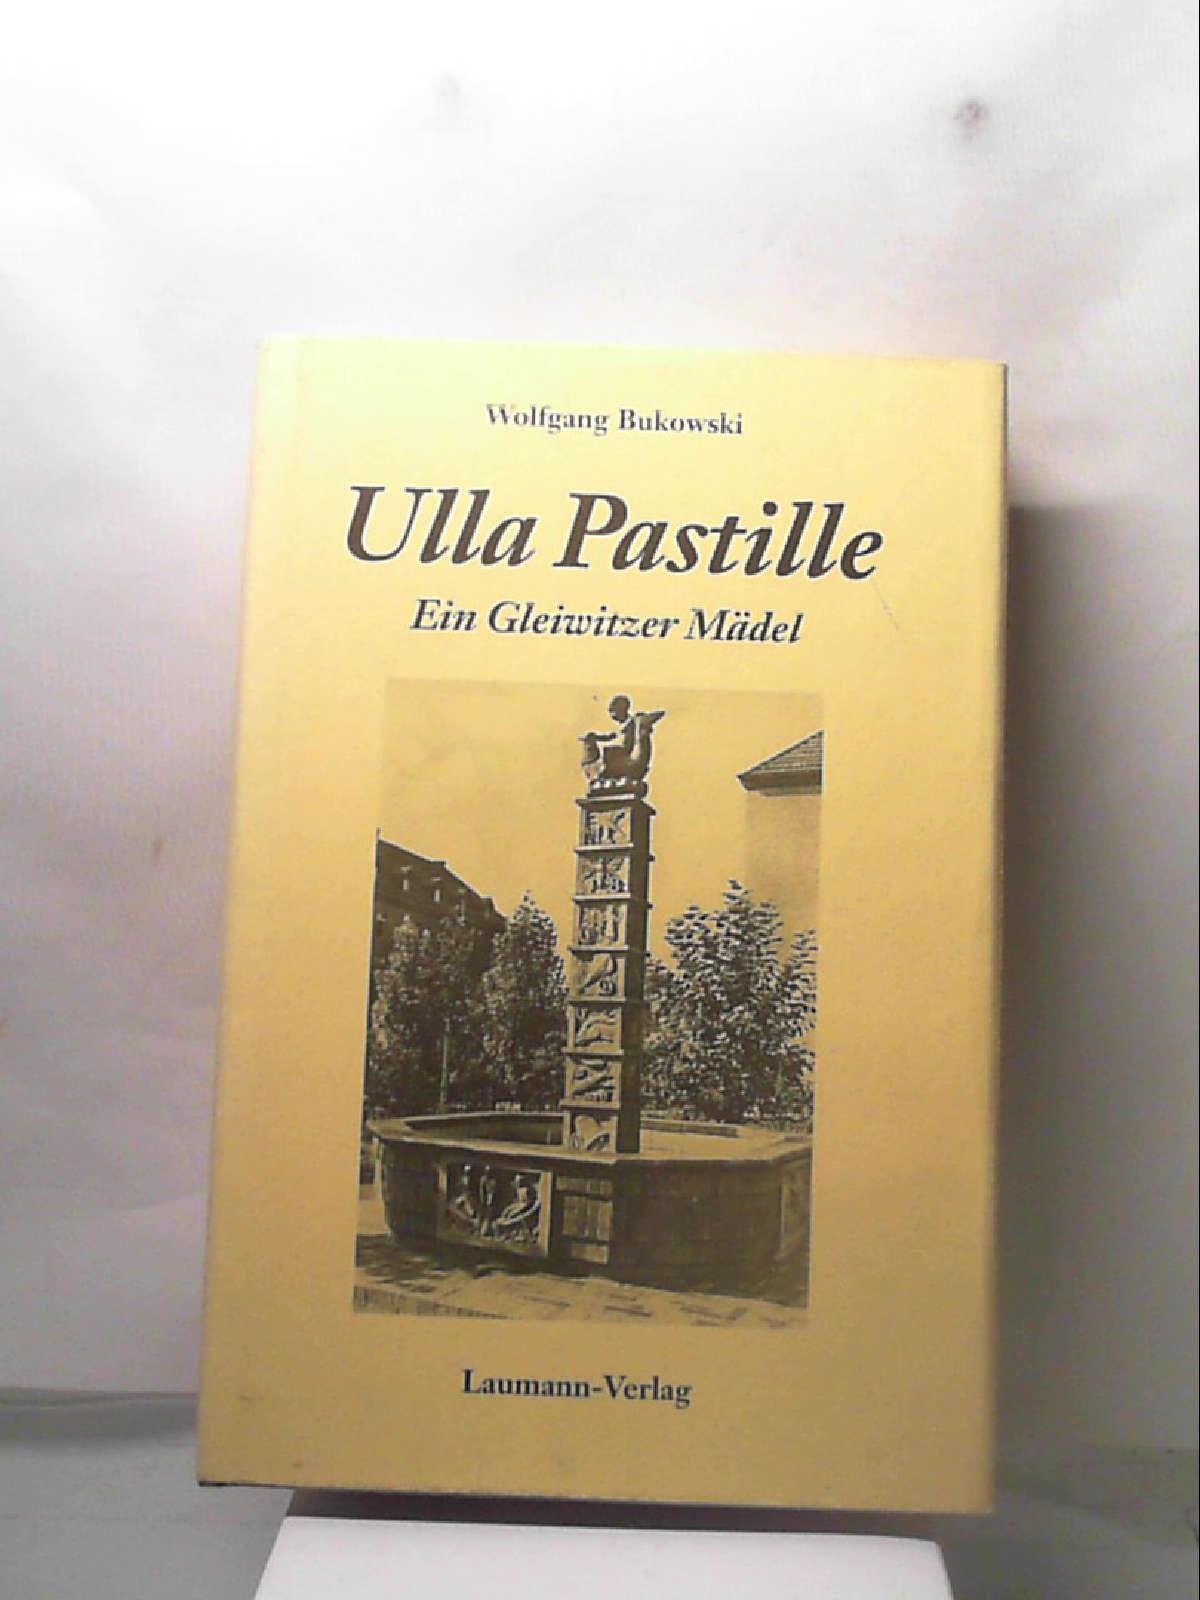 Ulla Pastille: Ein Gleiwitzer Mädchen Bukowski, Wolfgang - Wolfgang Bukowski